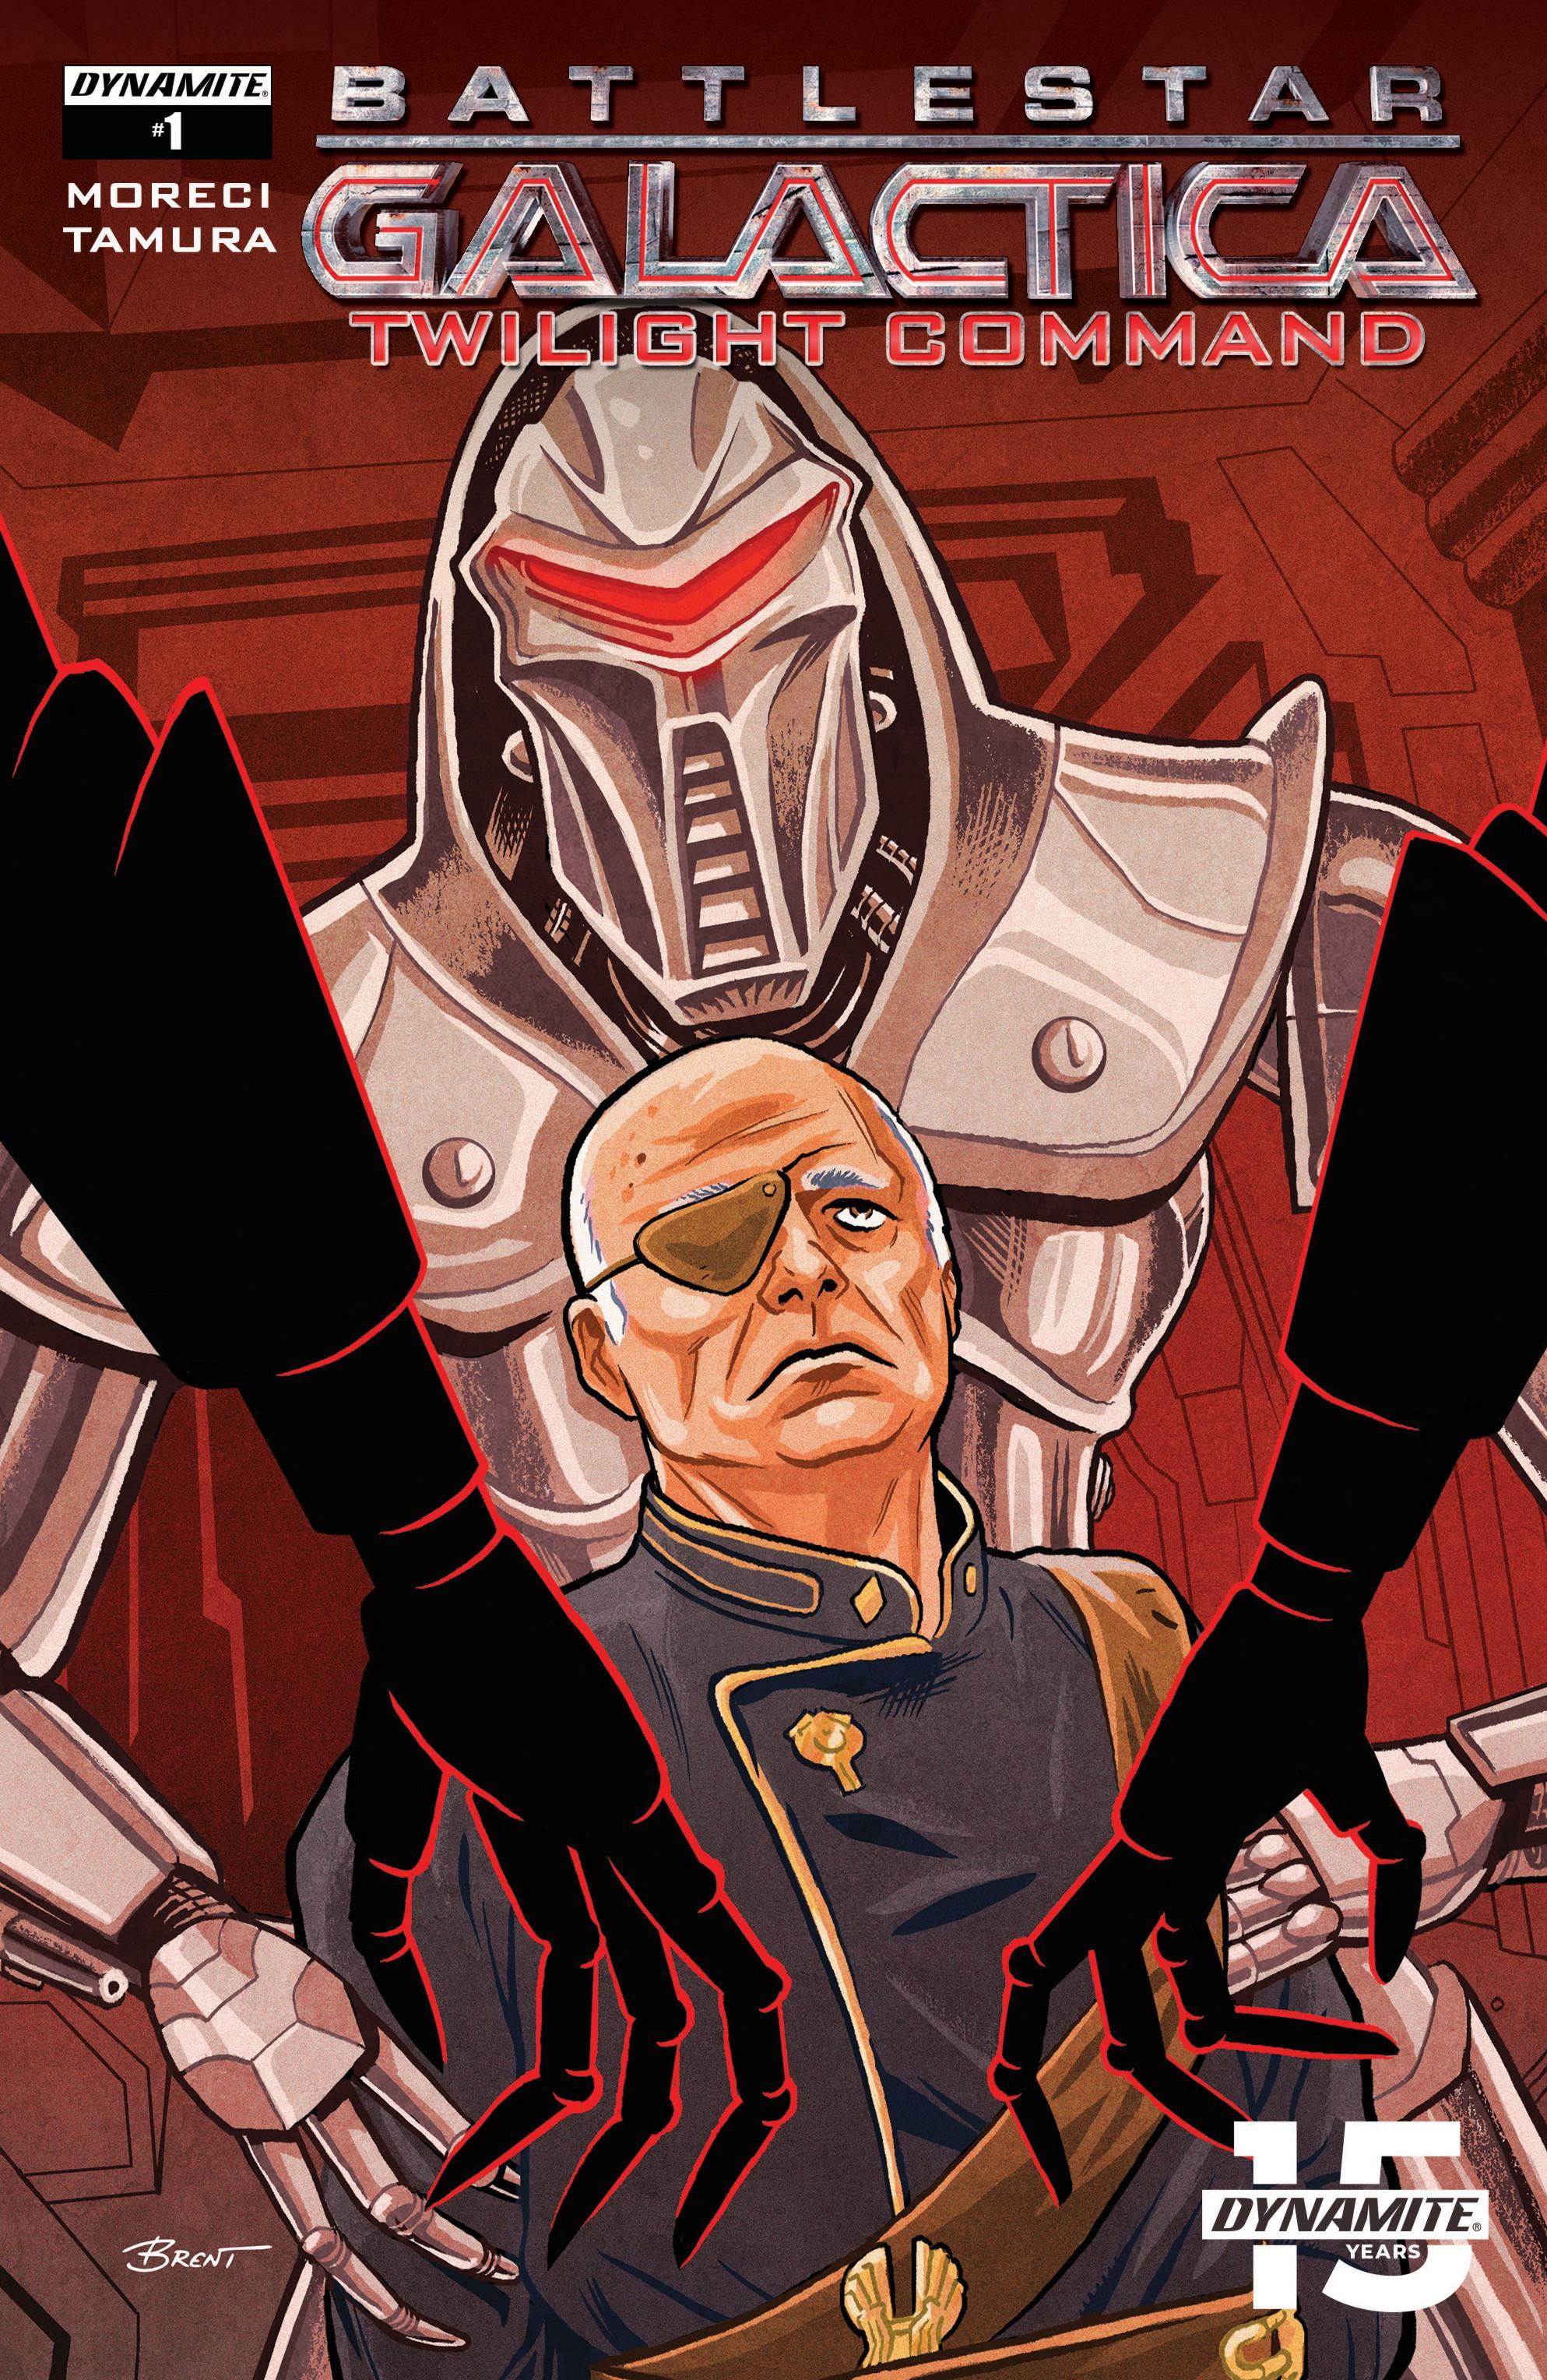 Battlestar Galactica-Twilight Command 001 2019 2 covers digital Son of Ultron